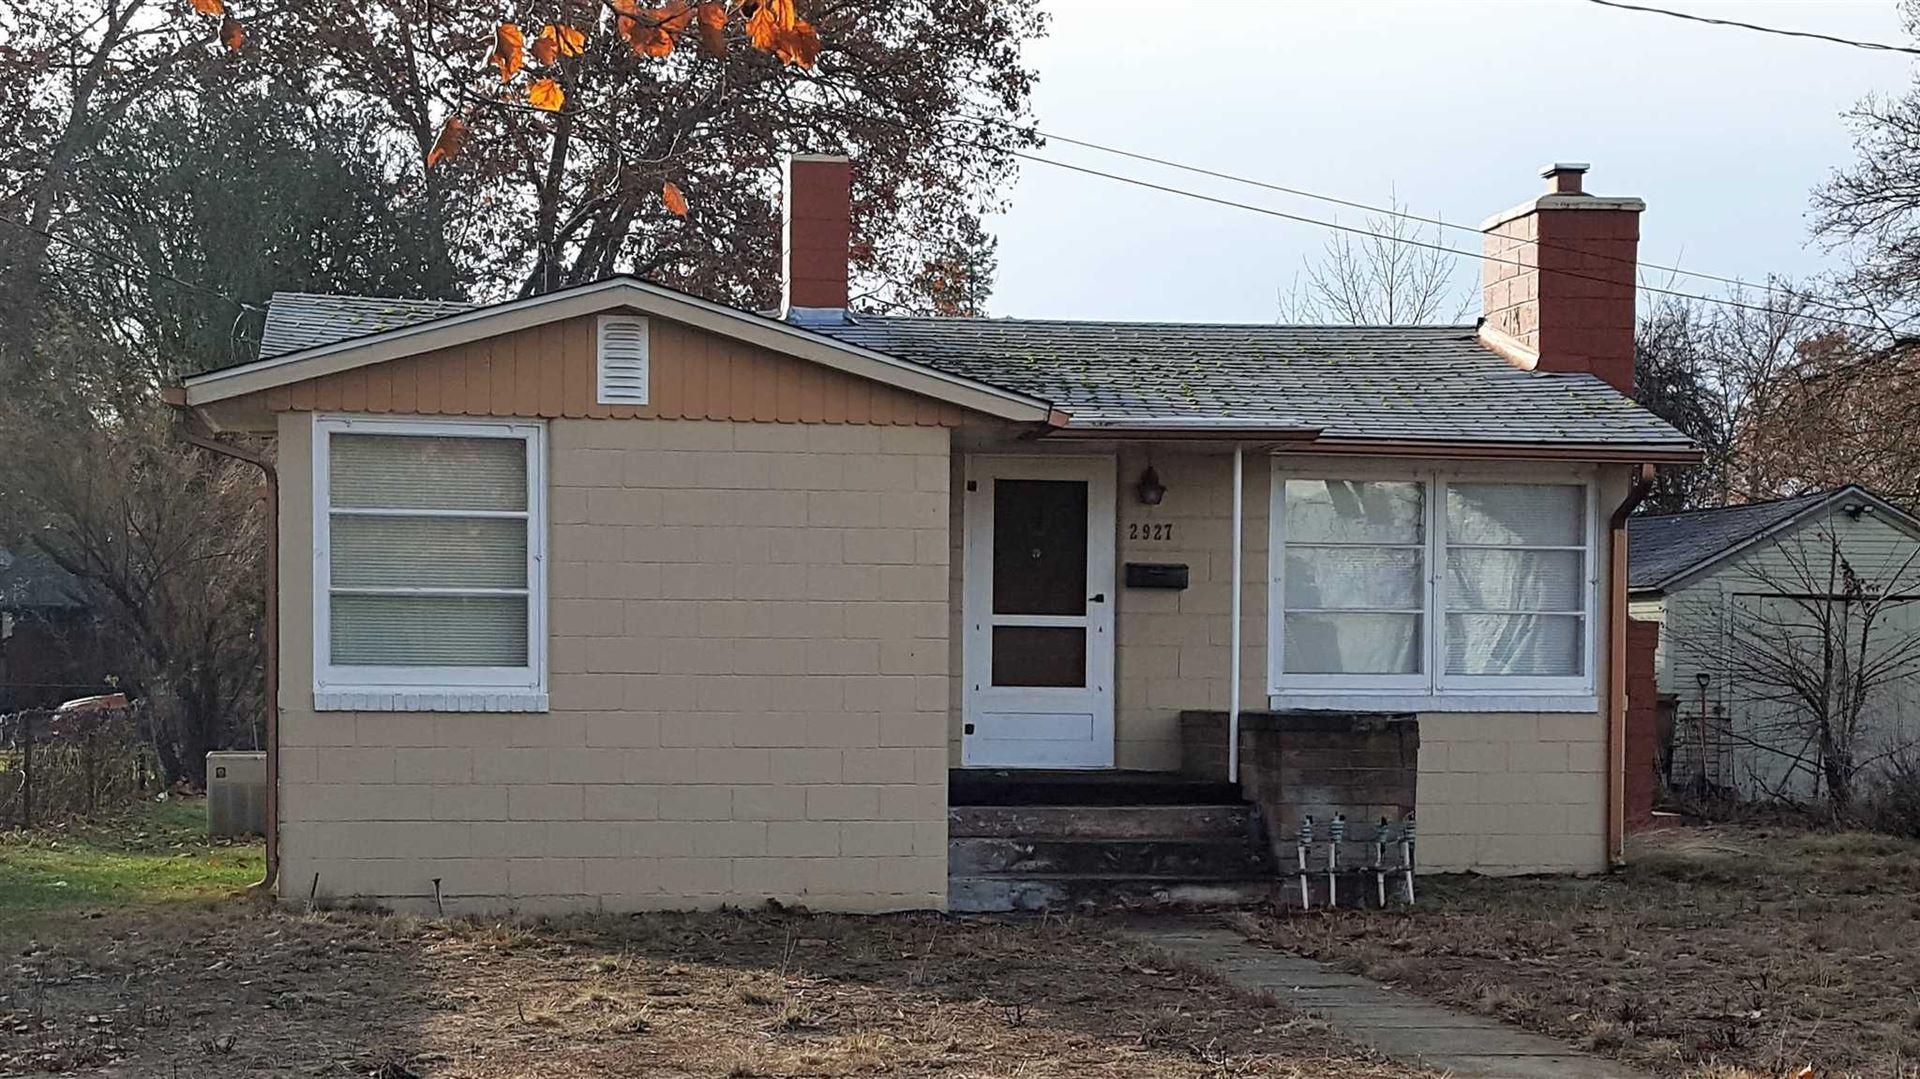 2927 W Gardner Ave, Spokane, WA 99201-1538 - #: 202110384